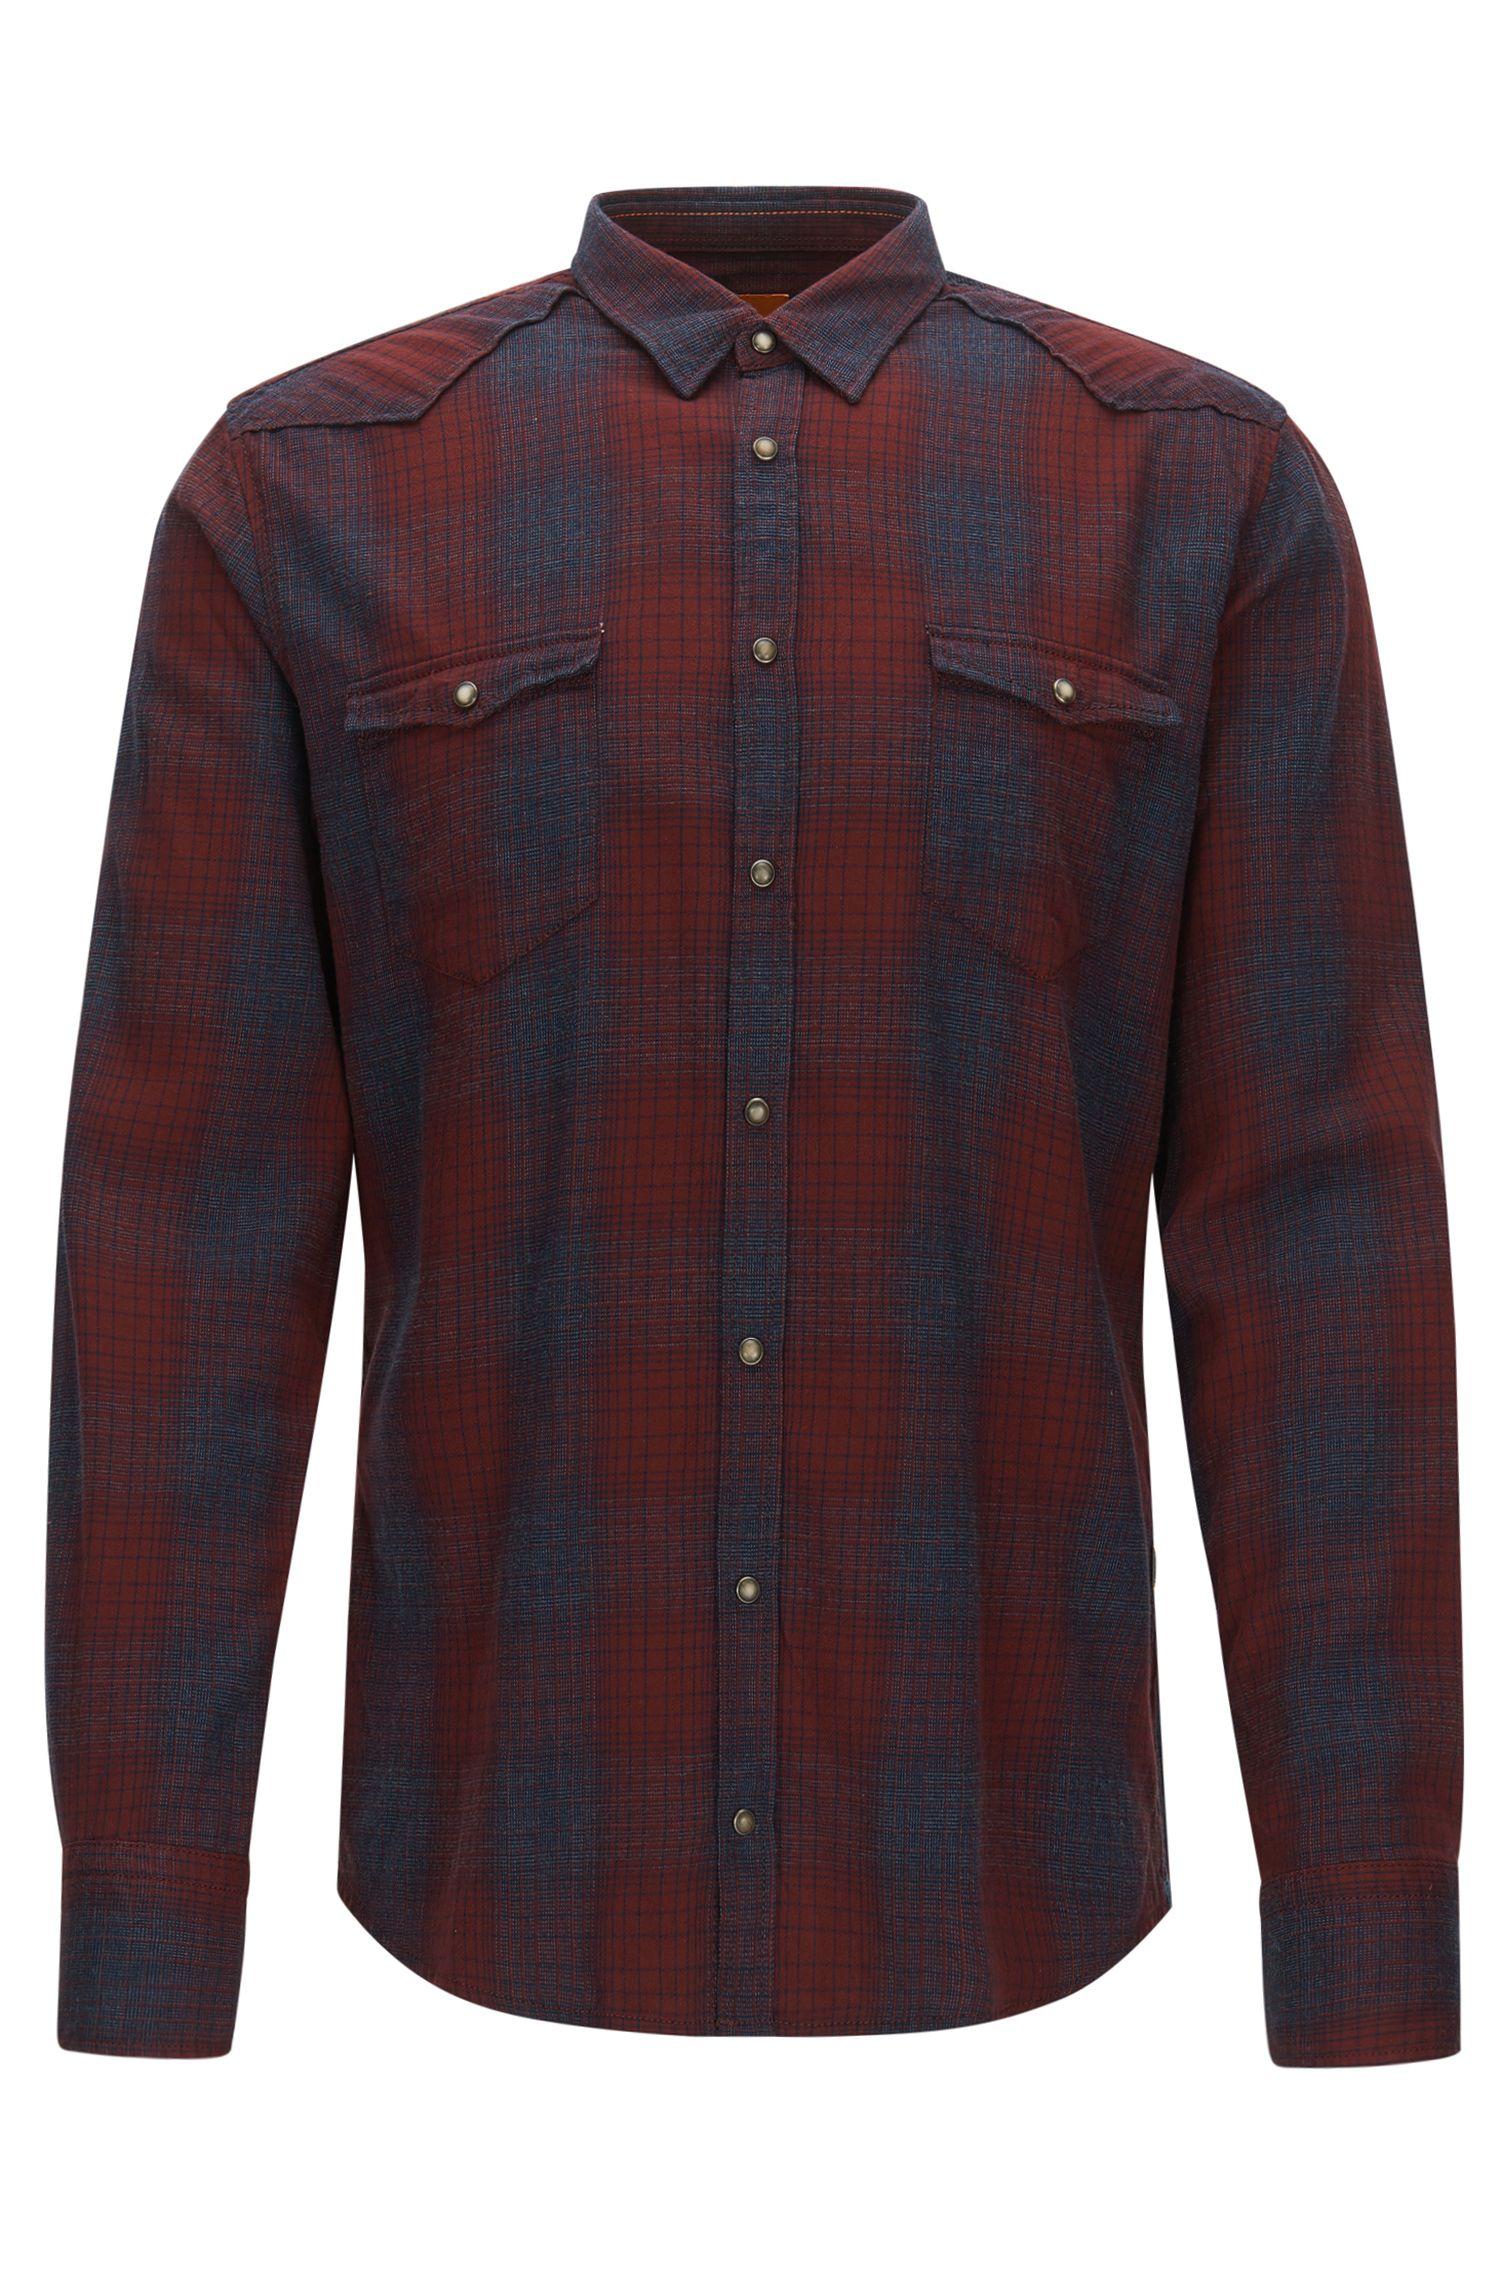 'Erodeo'   Slim Fit, Plaid Stretch Cotton Button Down Shirt